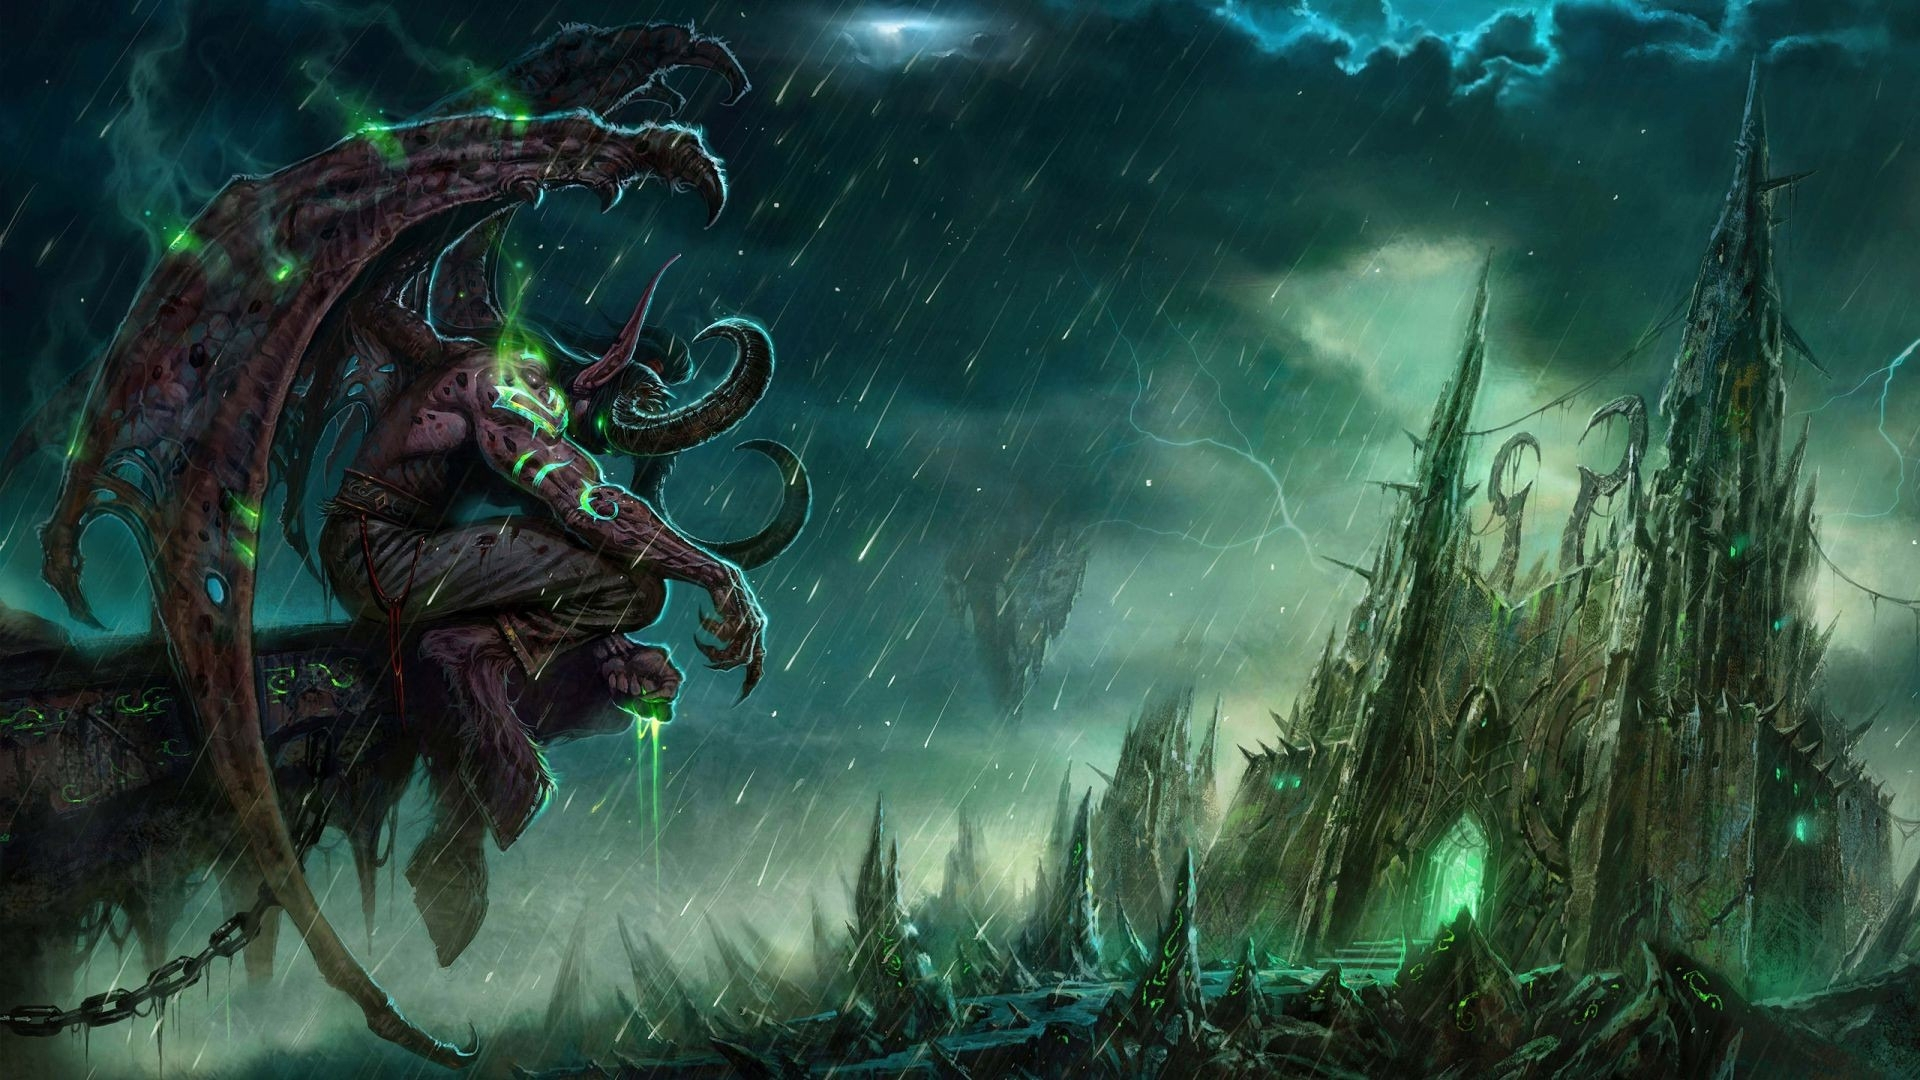 wallpaper world of warcraft hd gratuit à télécharger sur ngn mag